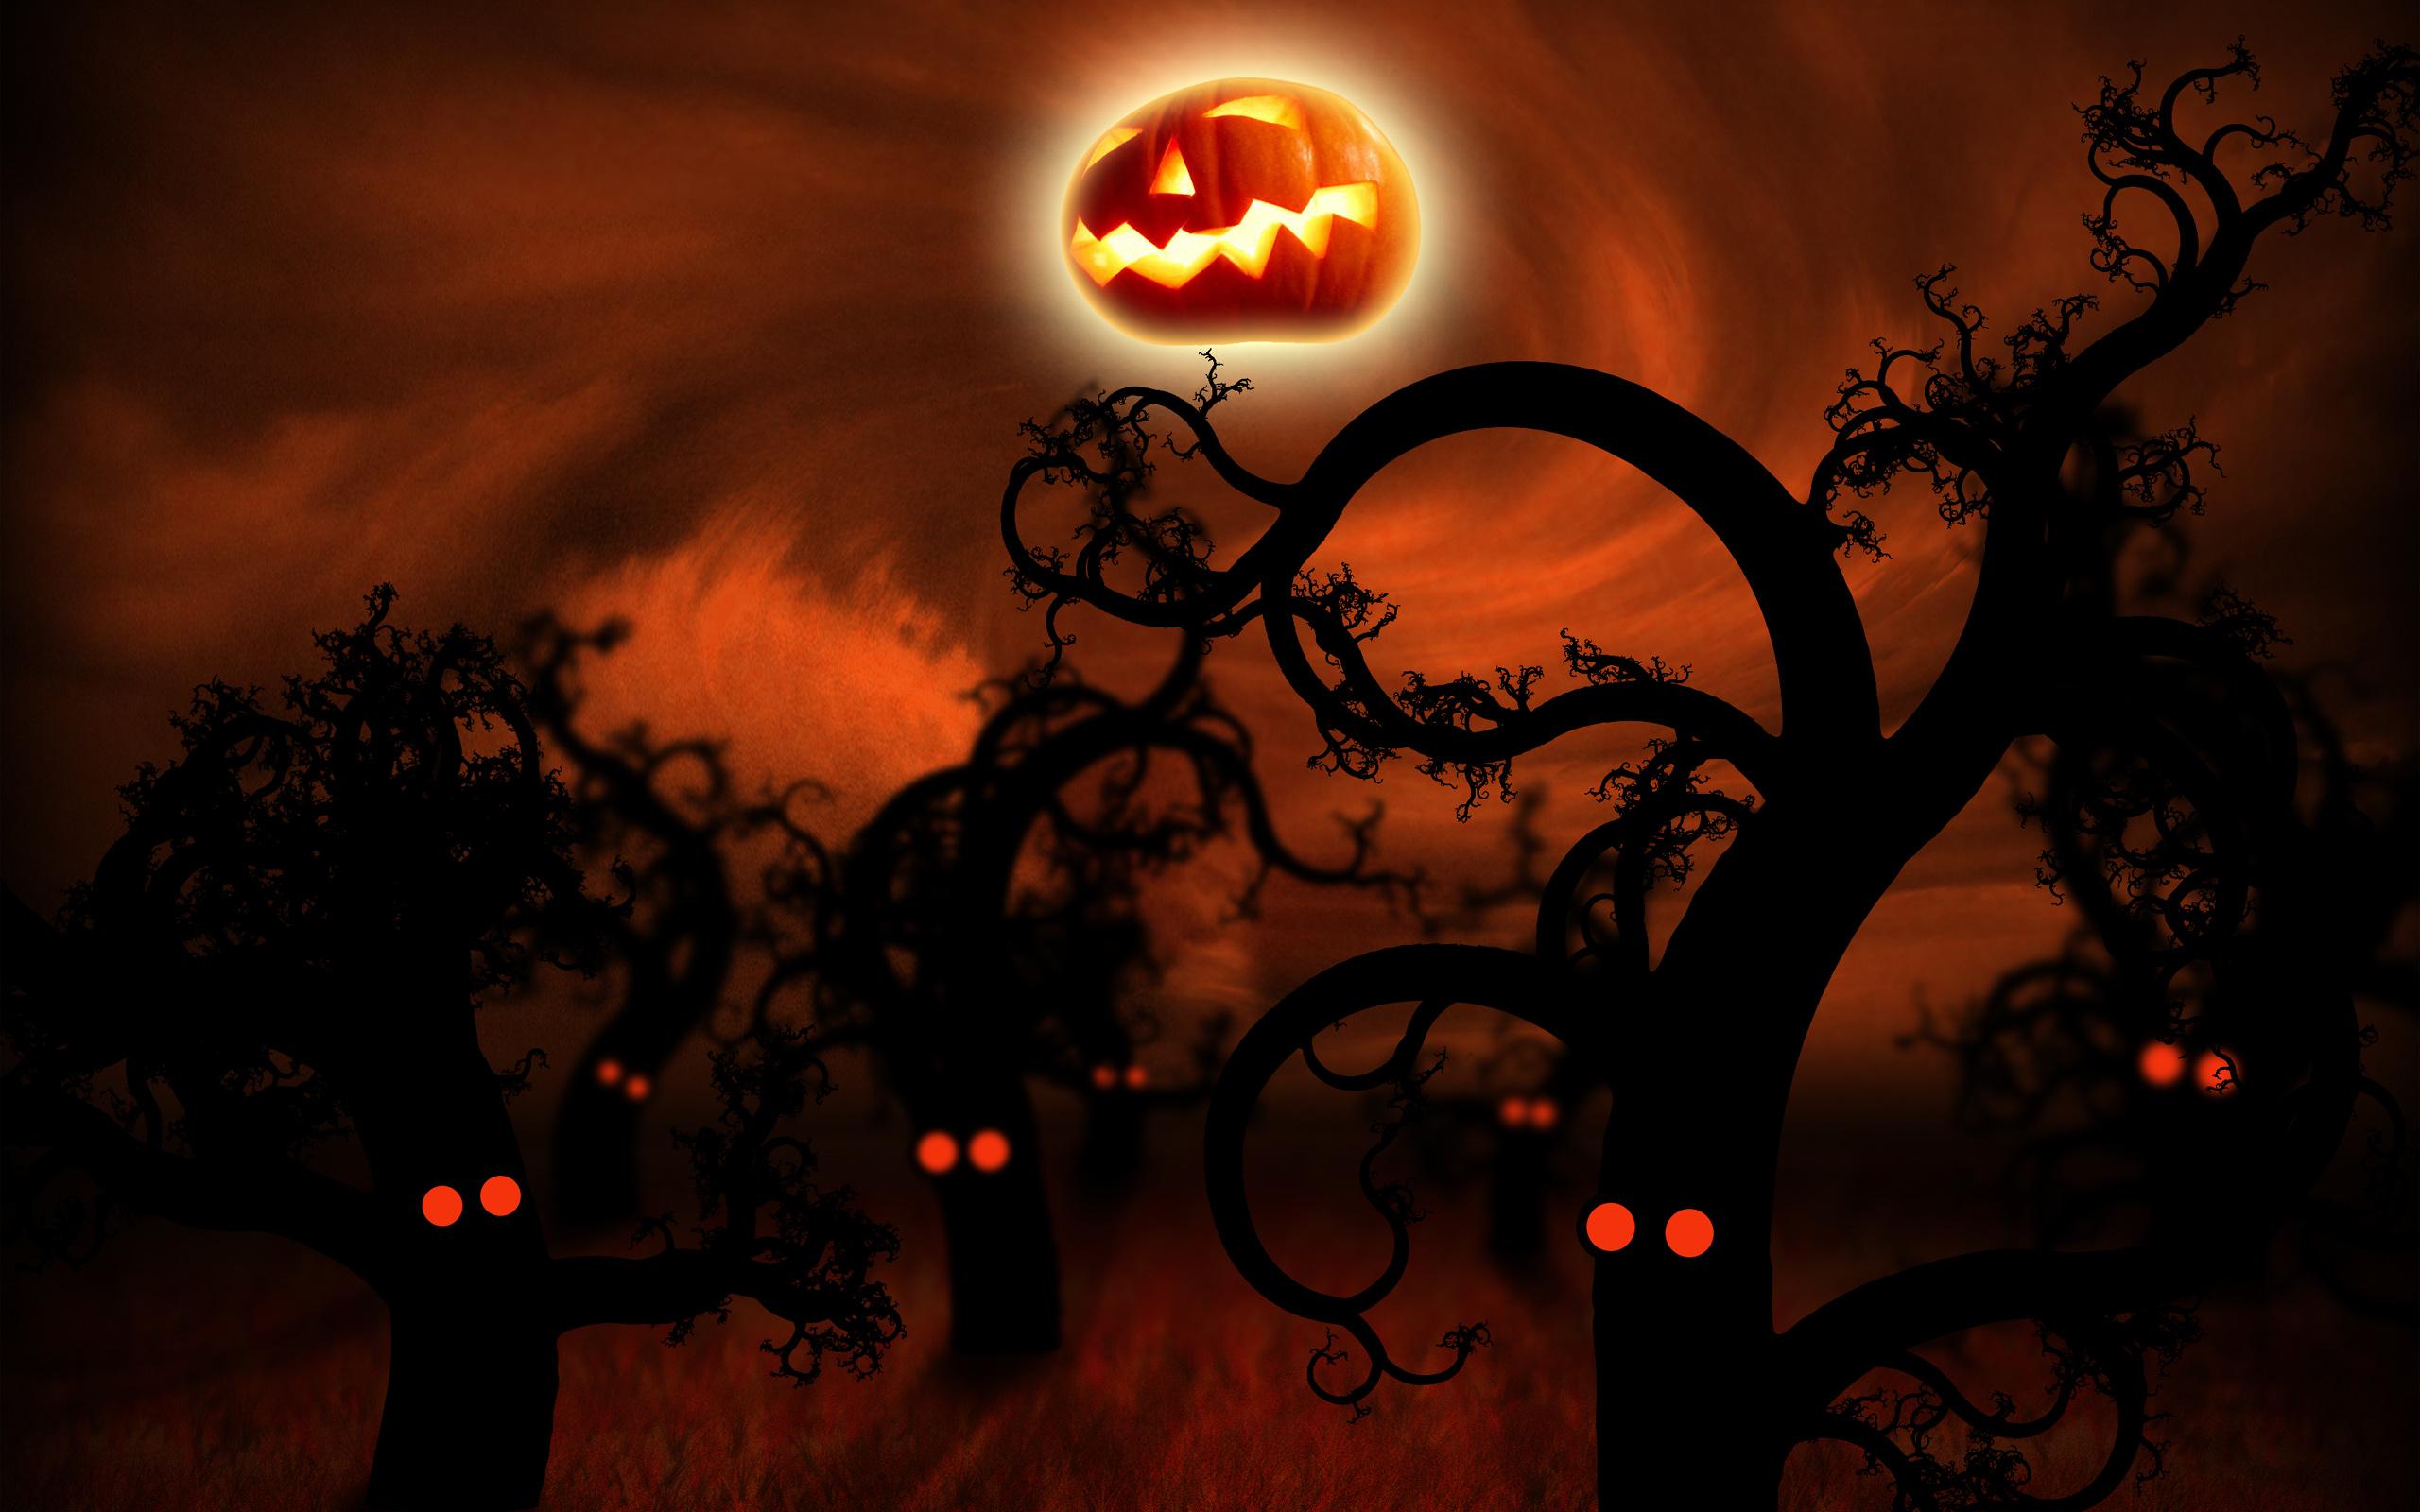 fantastic halloween wallpapers hd